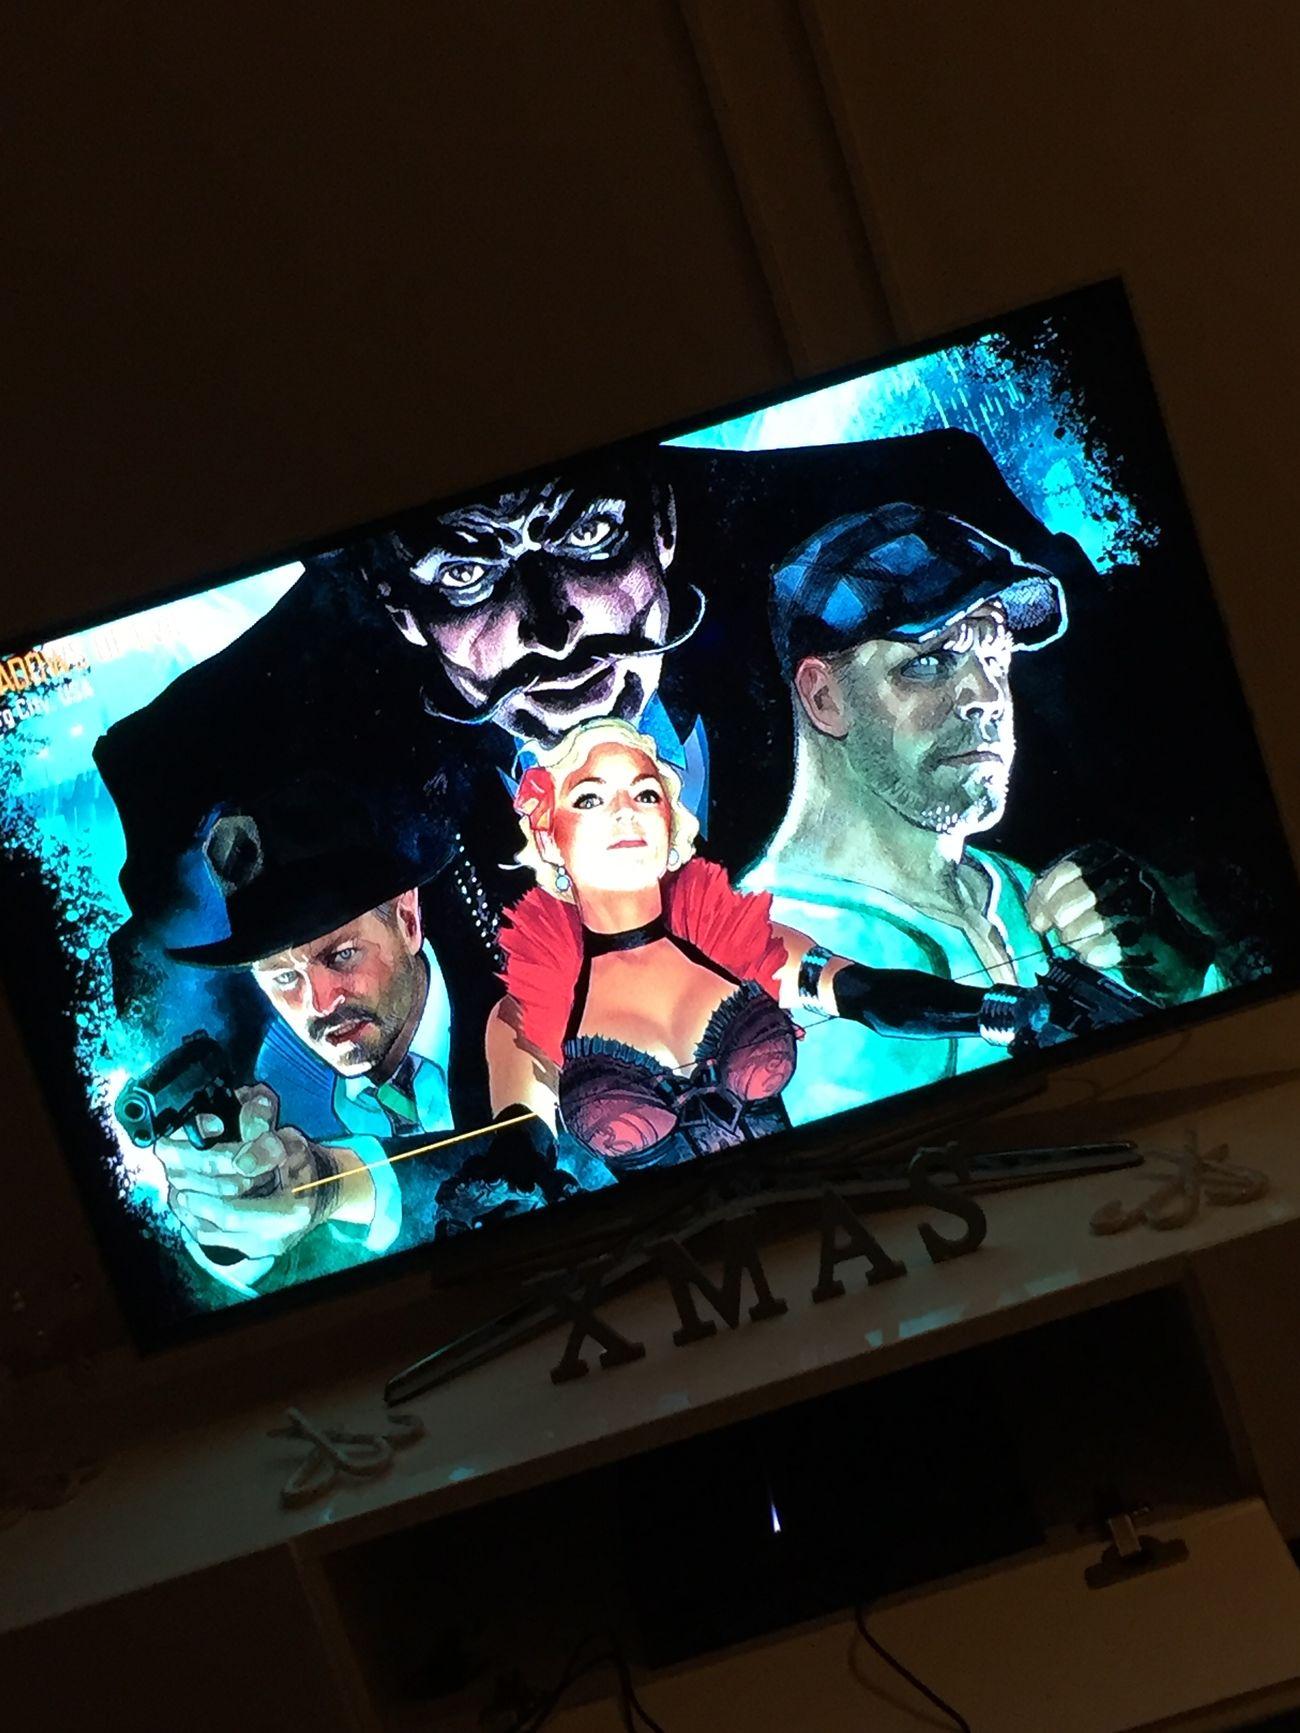 PS4 Blackops3 Blackops Zombie